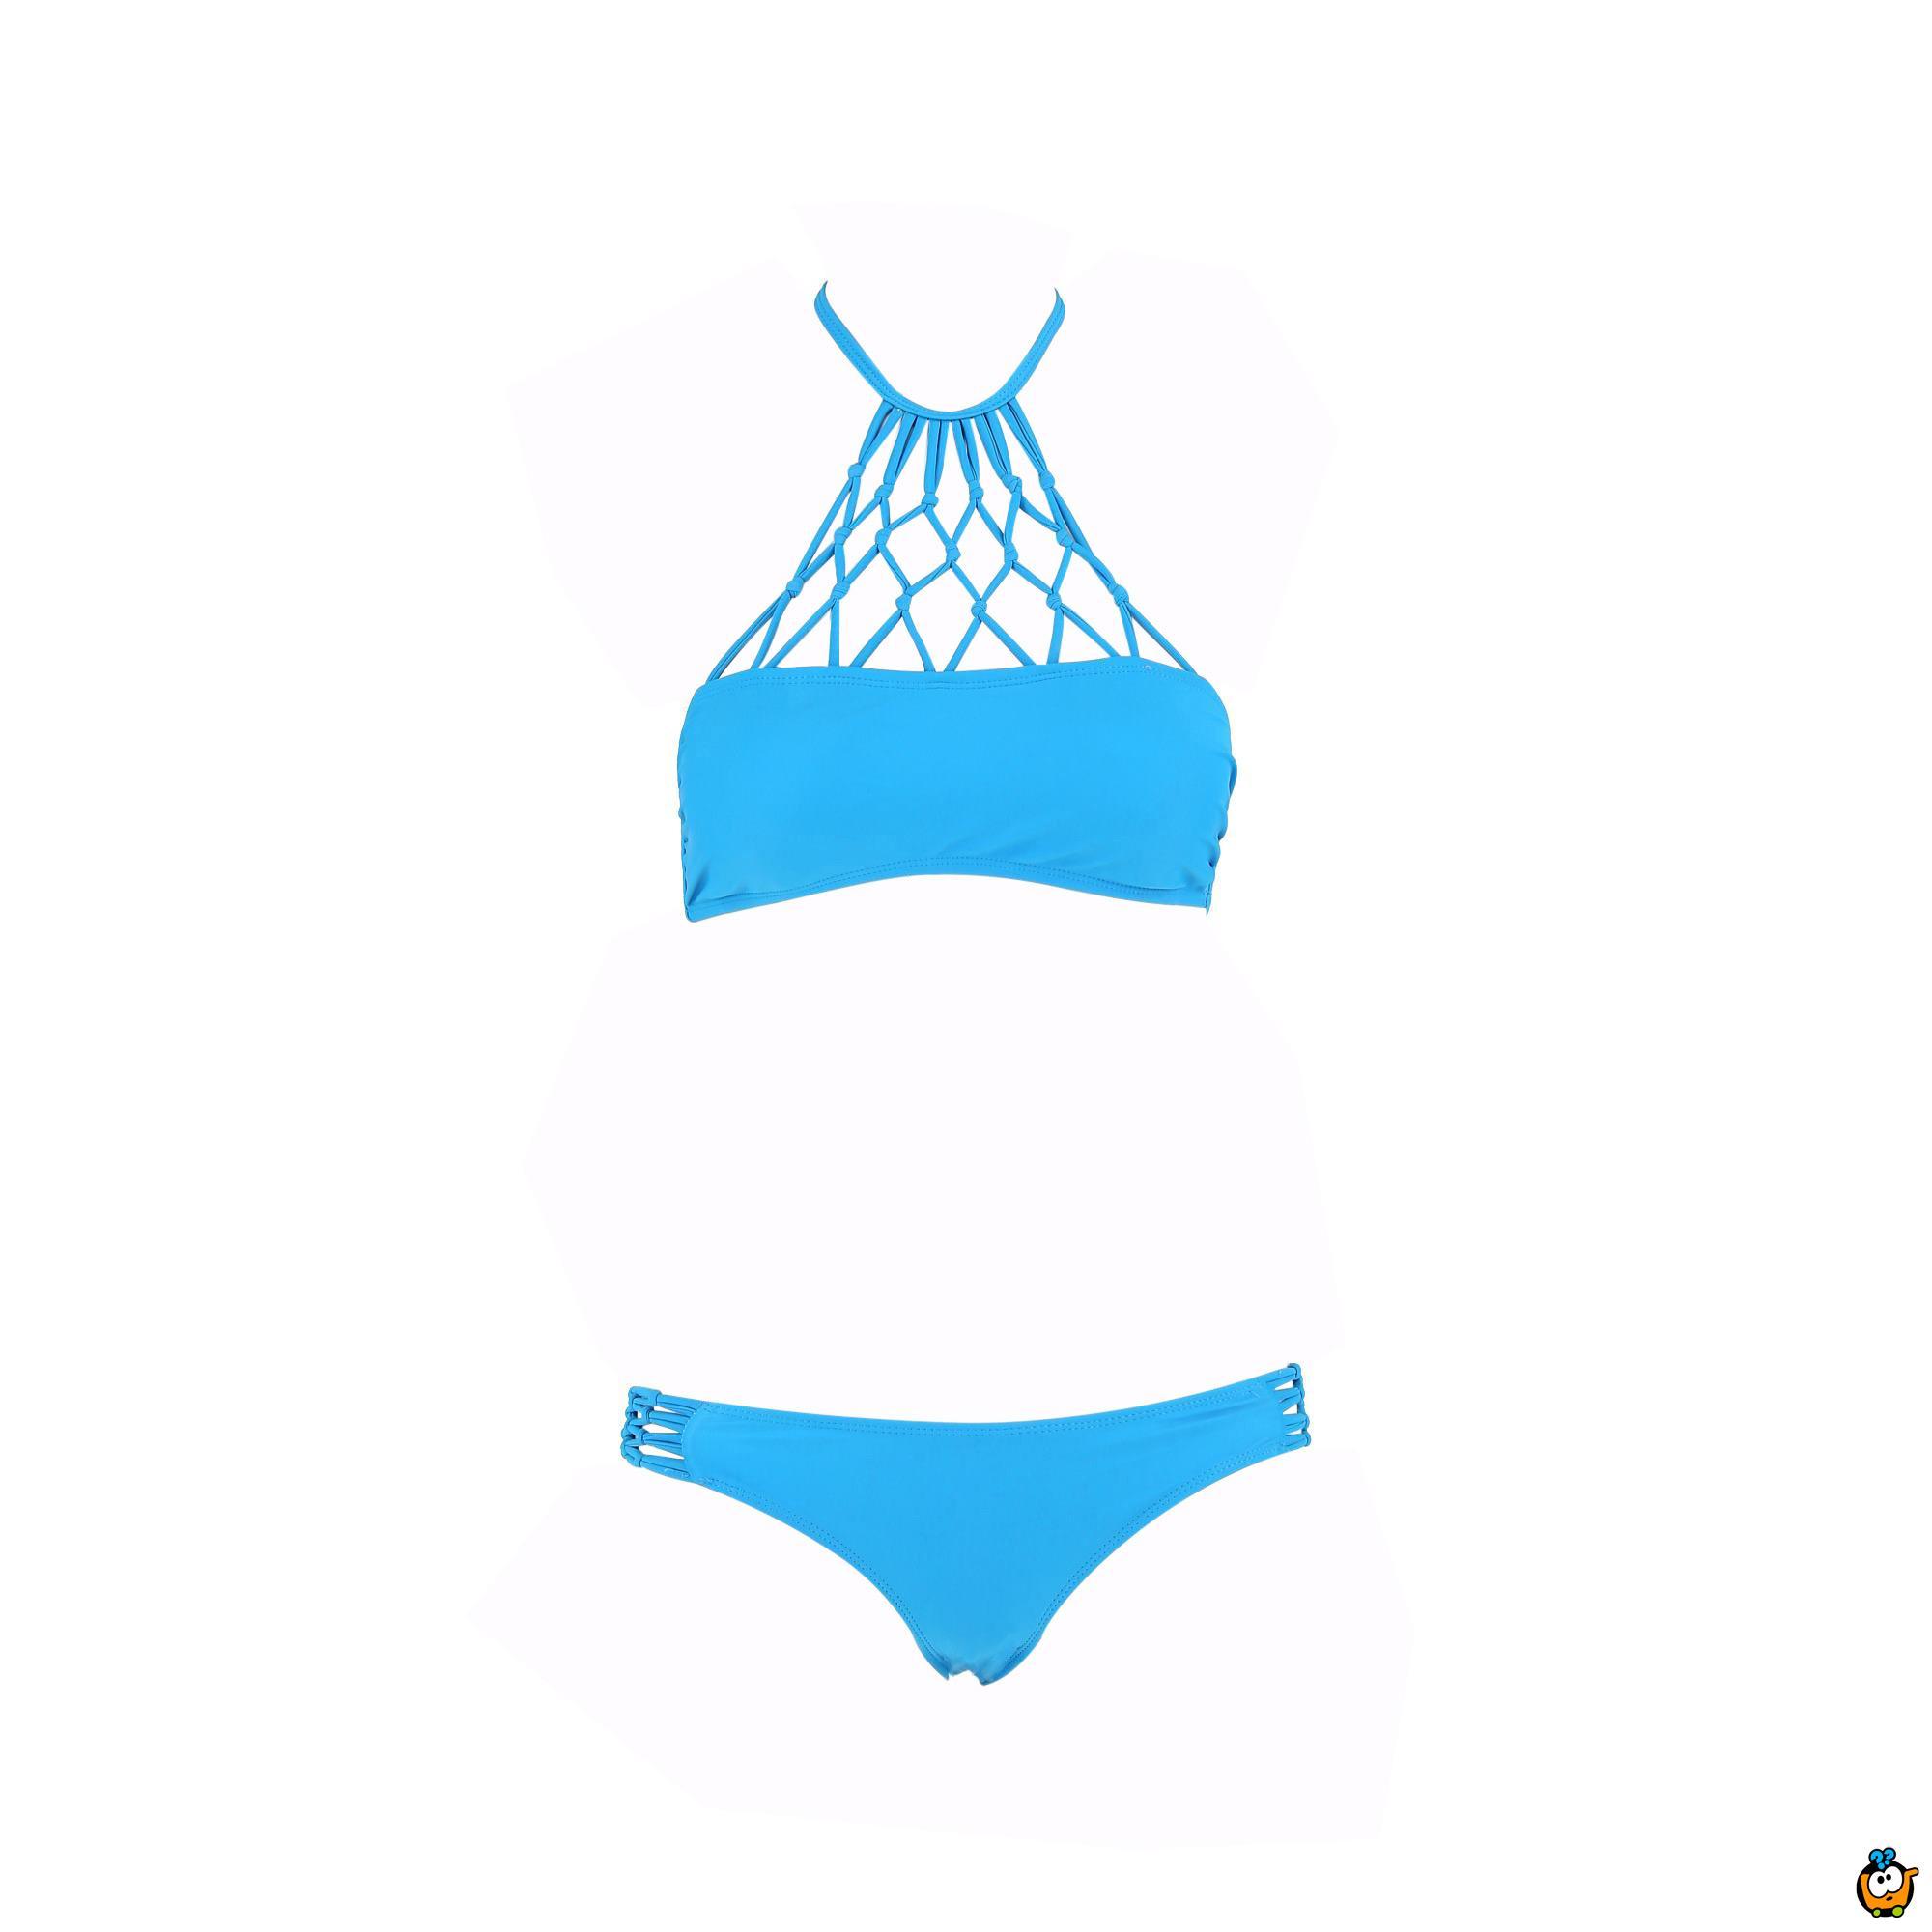 Dvodelni ženski kupaći kostim - SUPERMESH BLUE